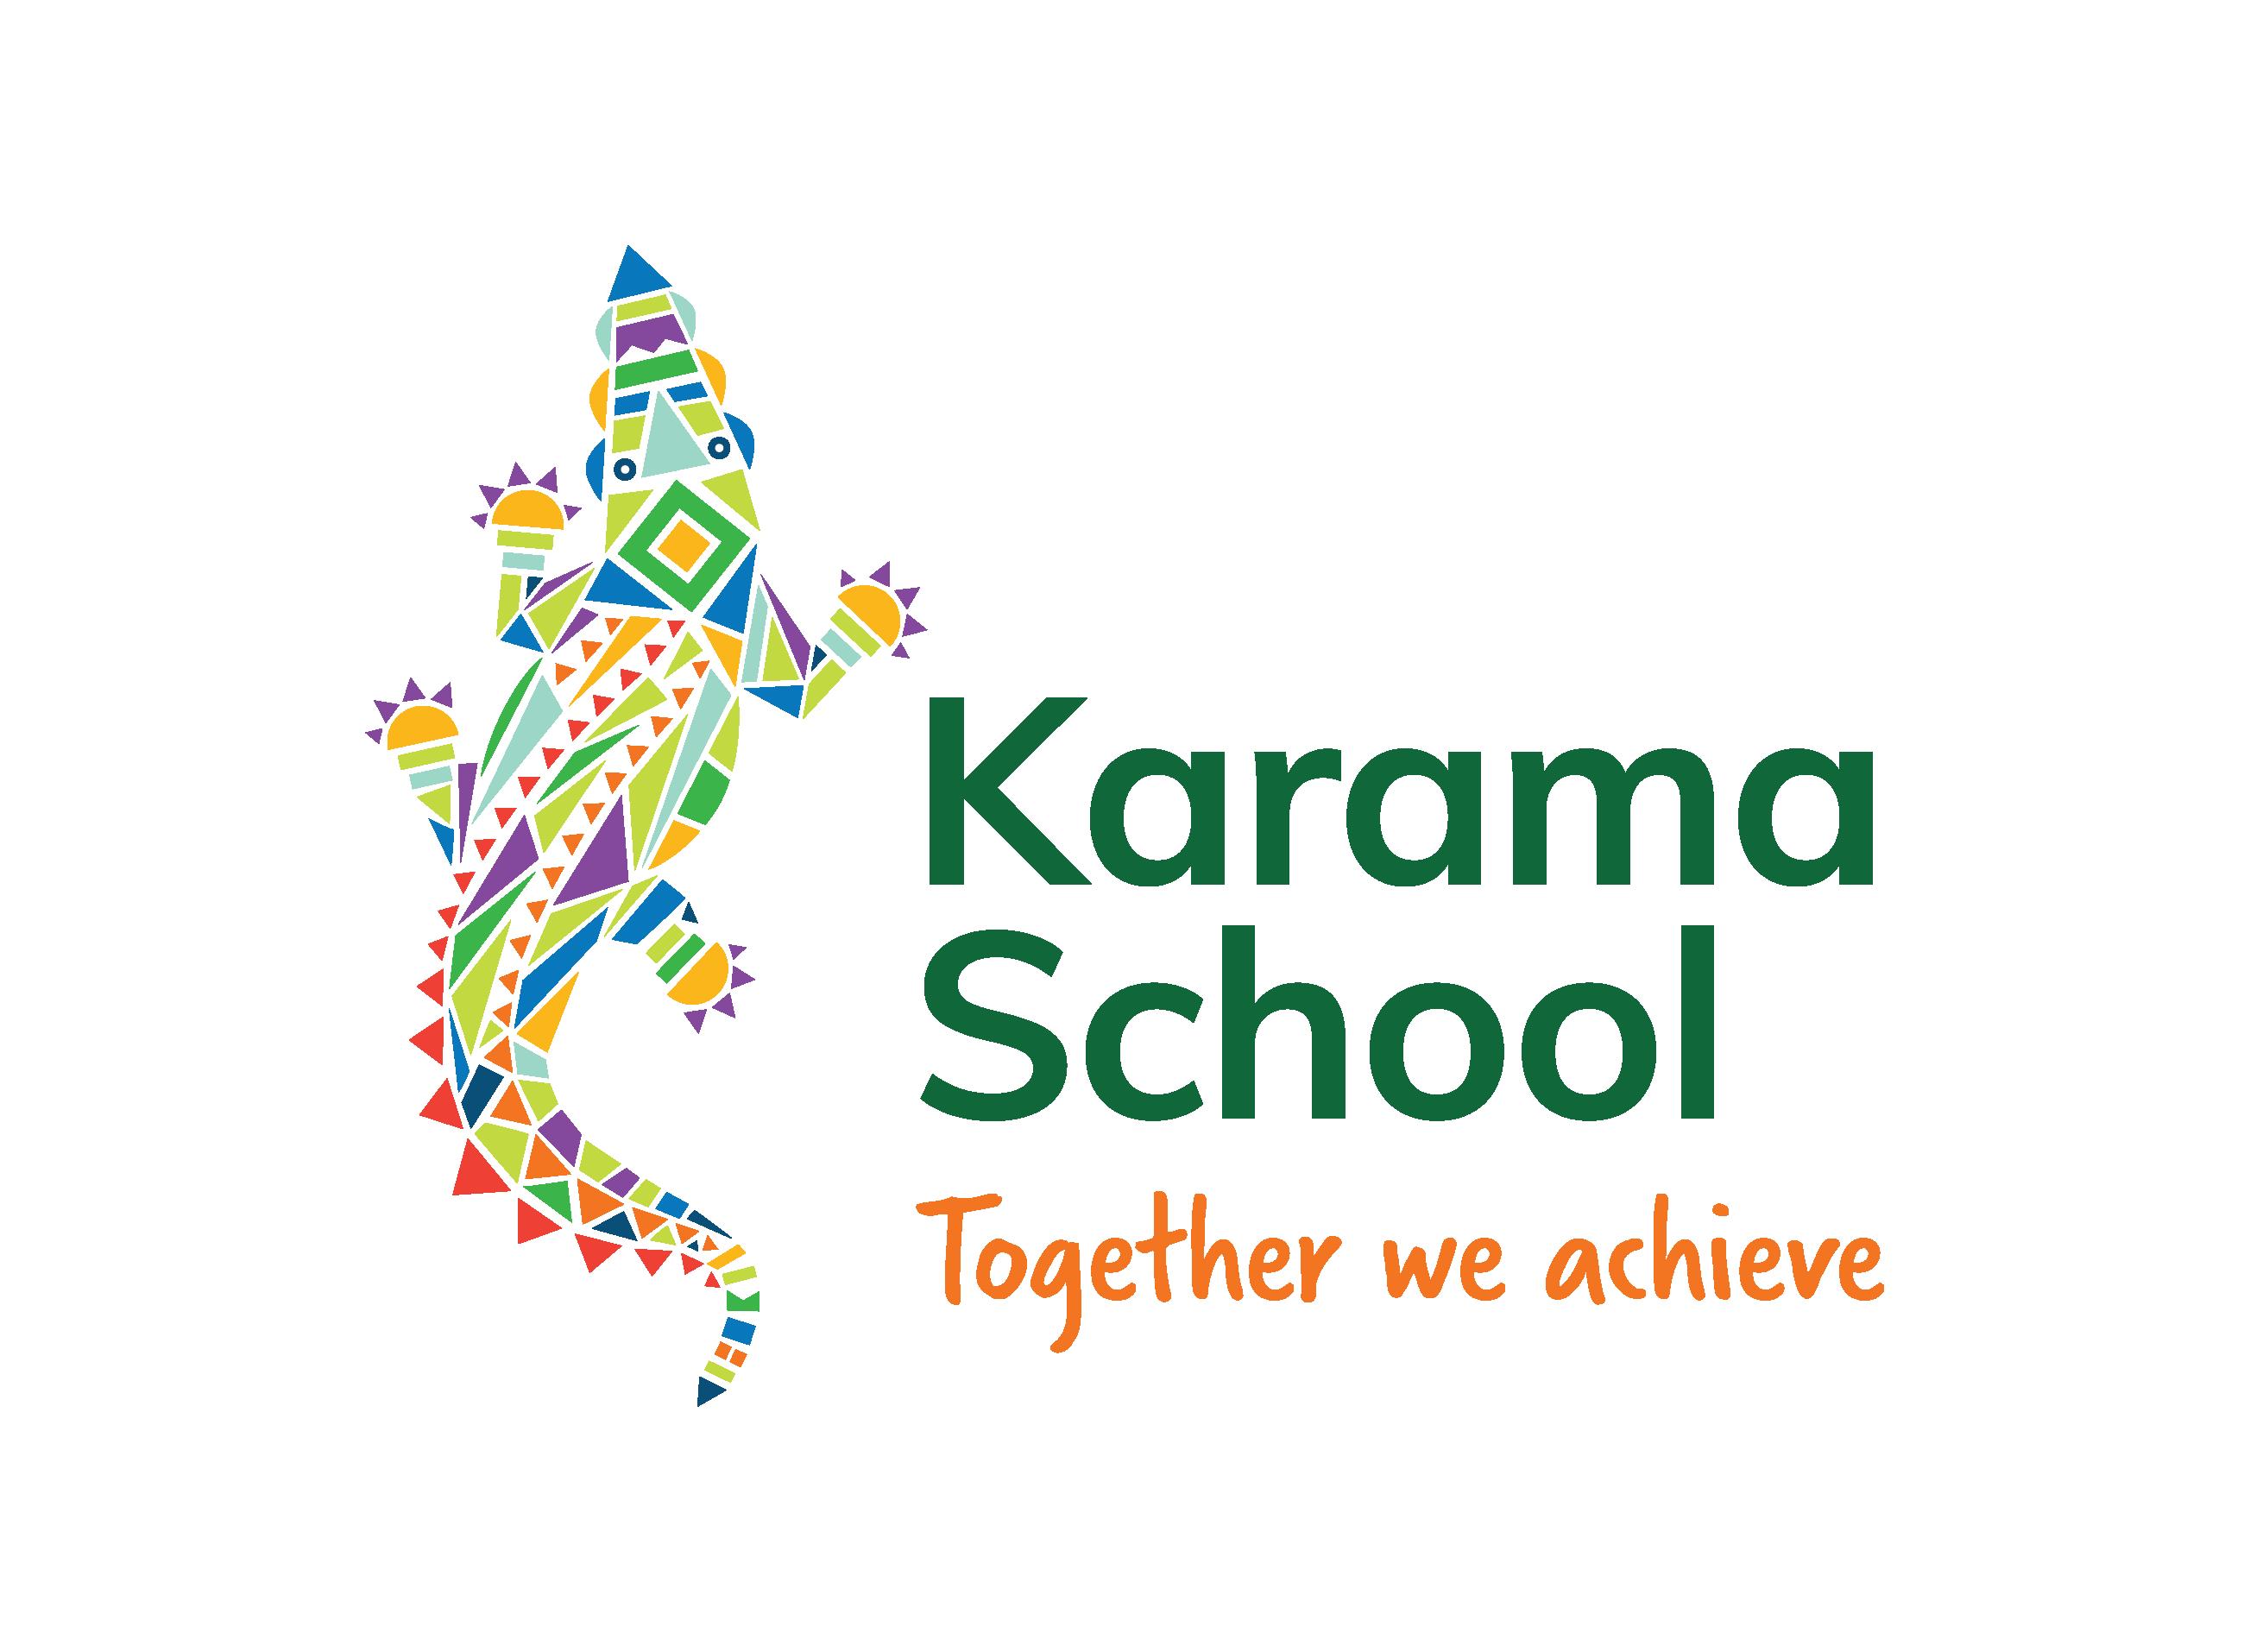 Karama School